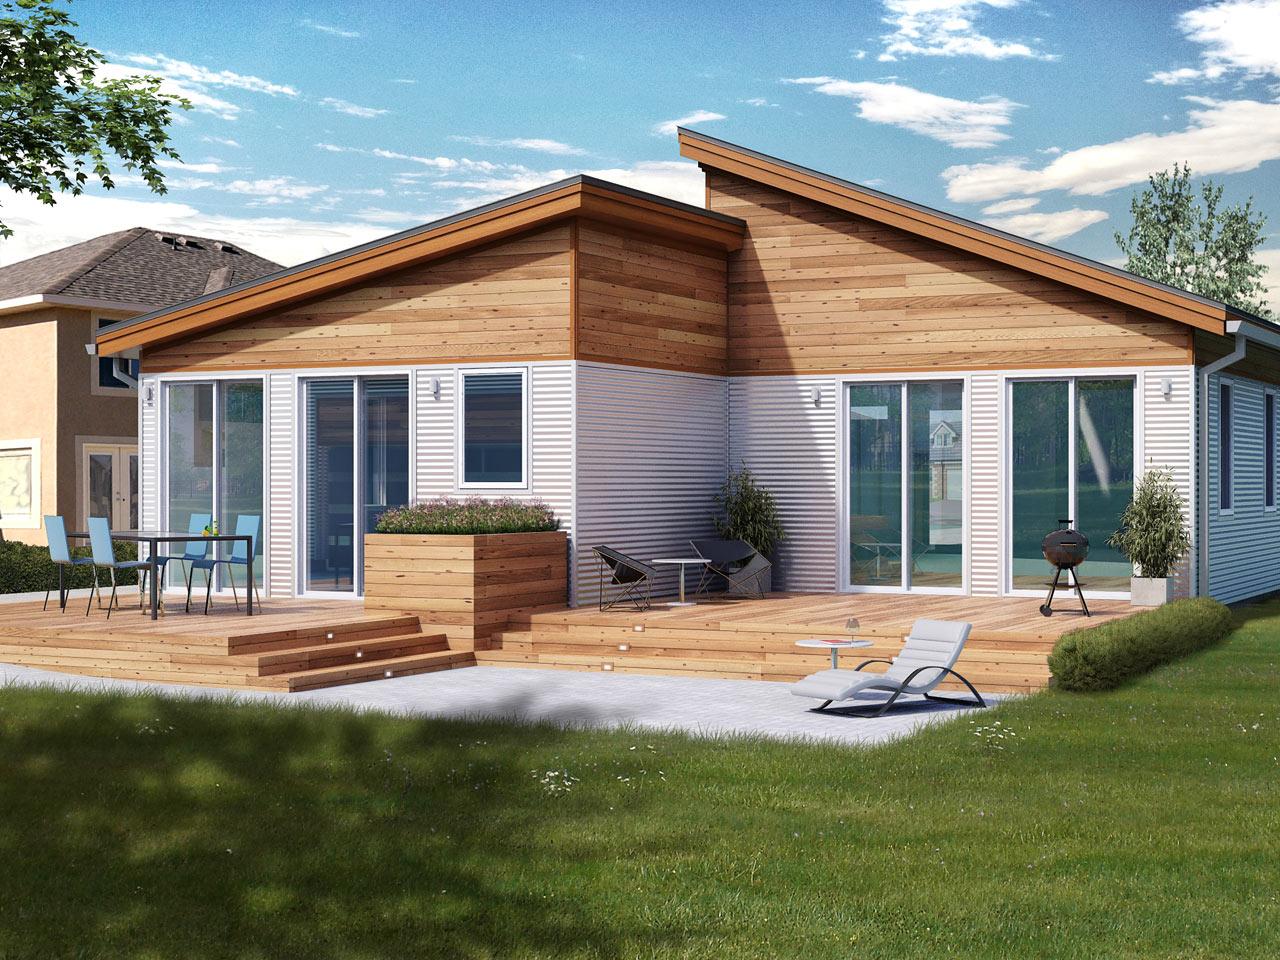 Blu Homes Balance Metro Designed for Narrow Lots